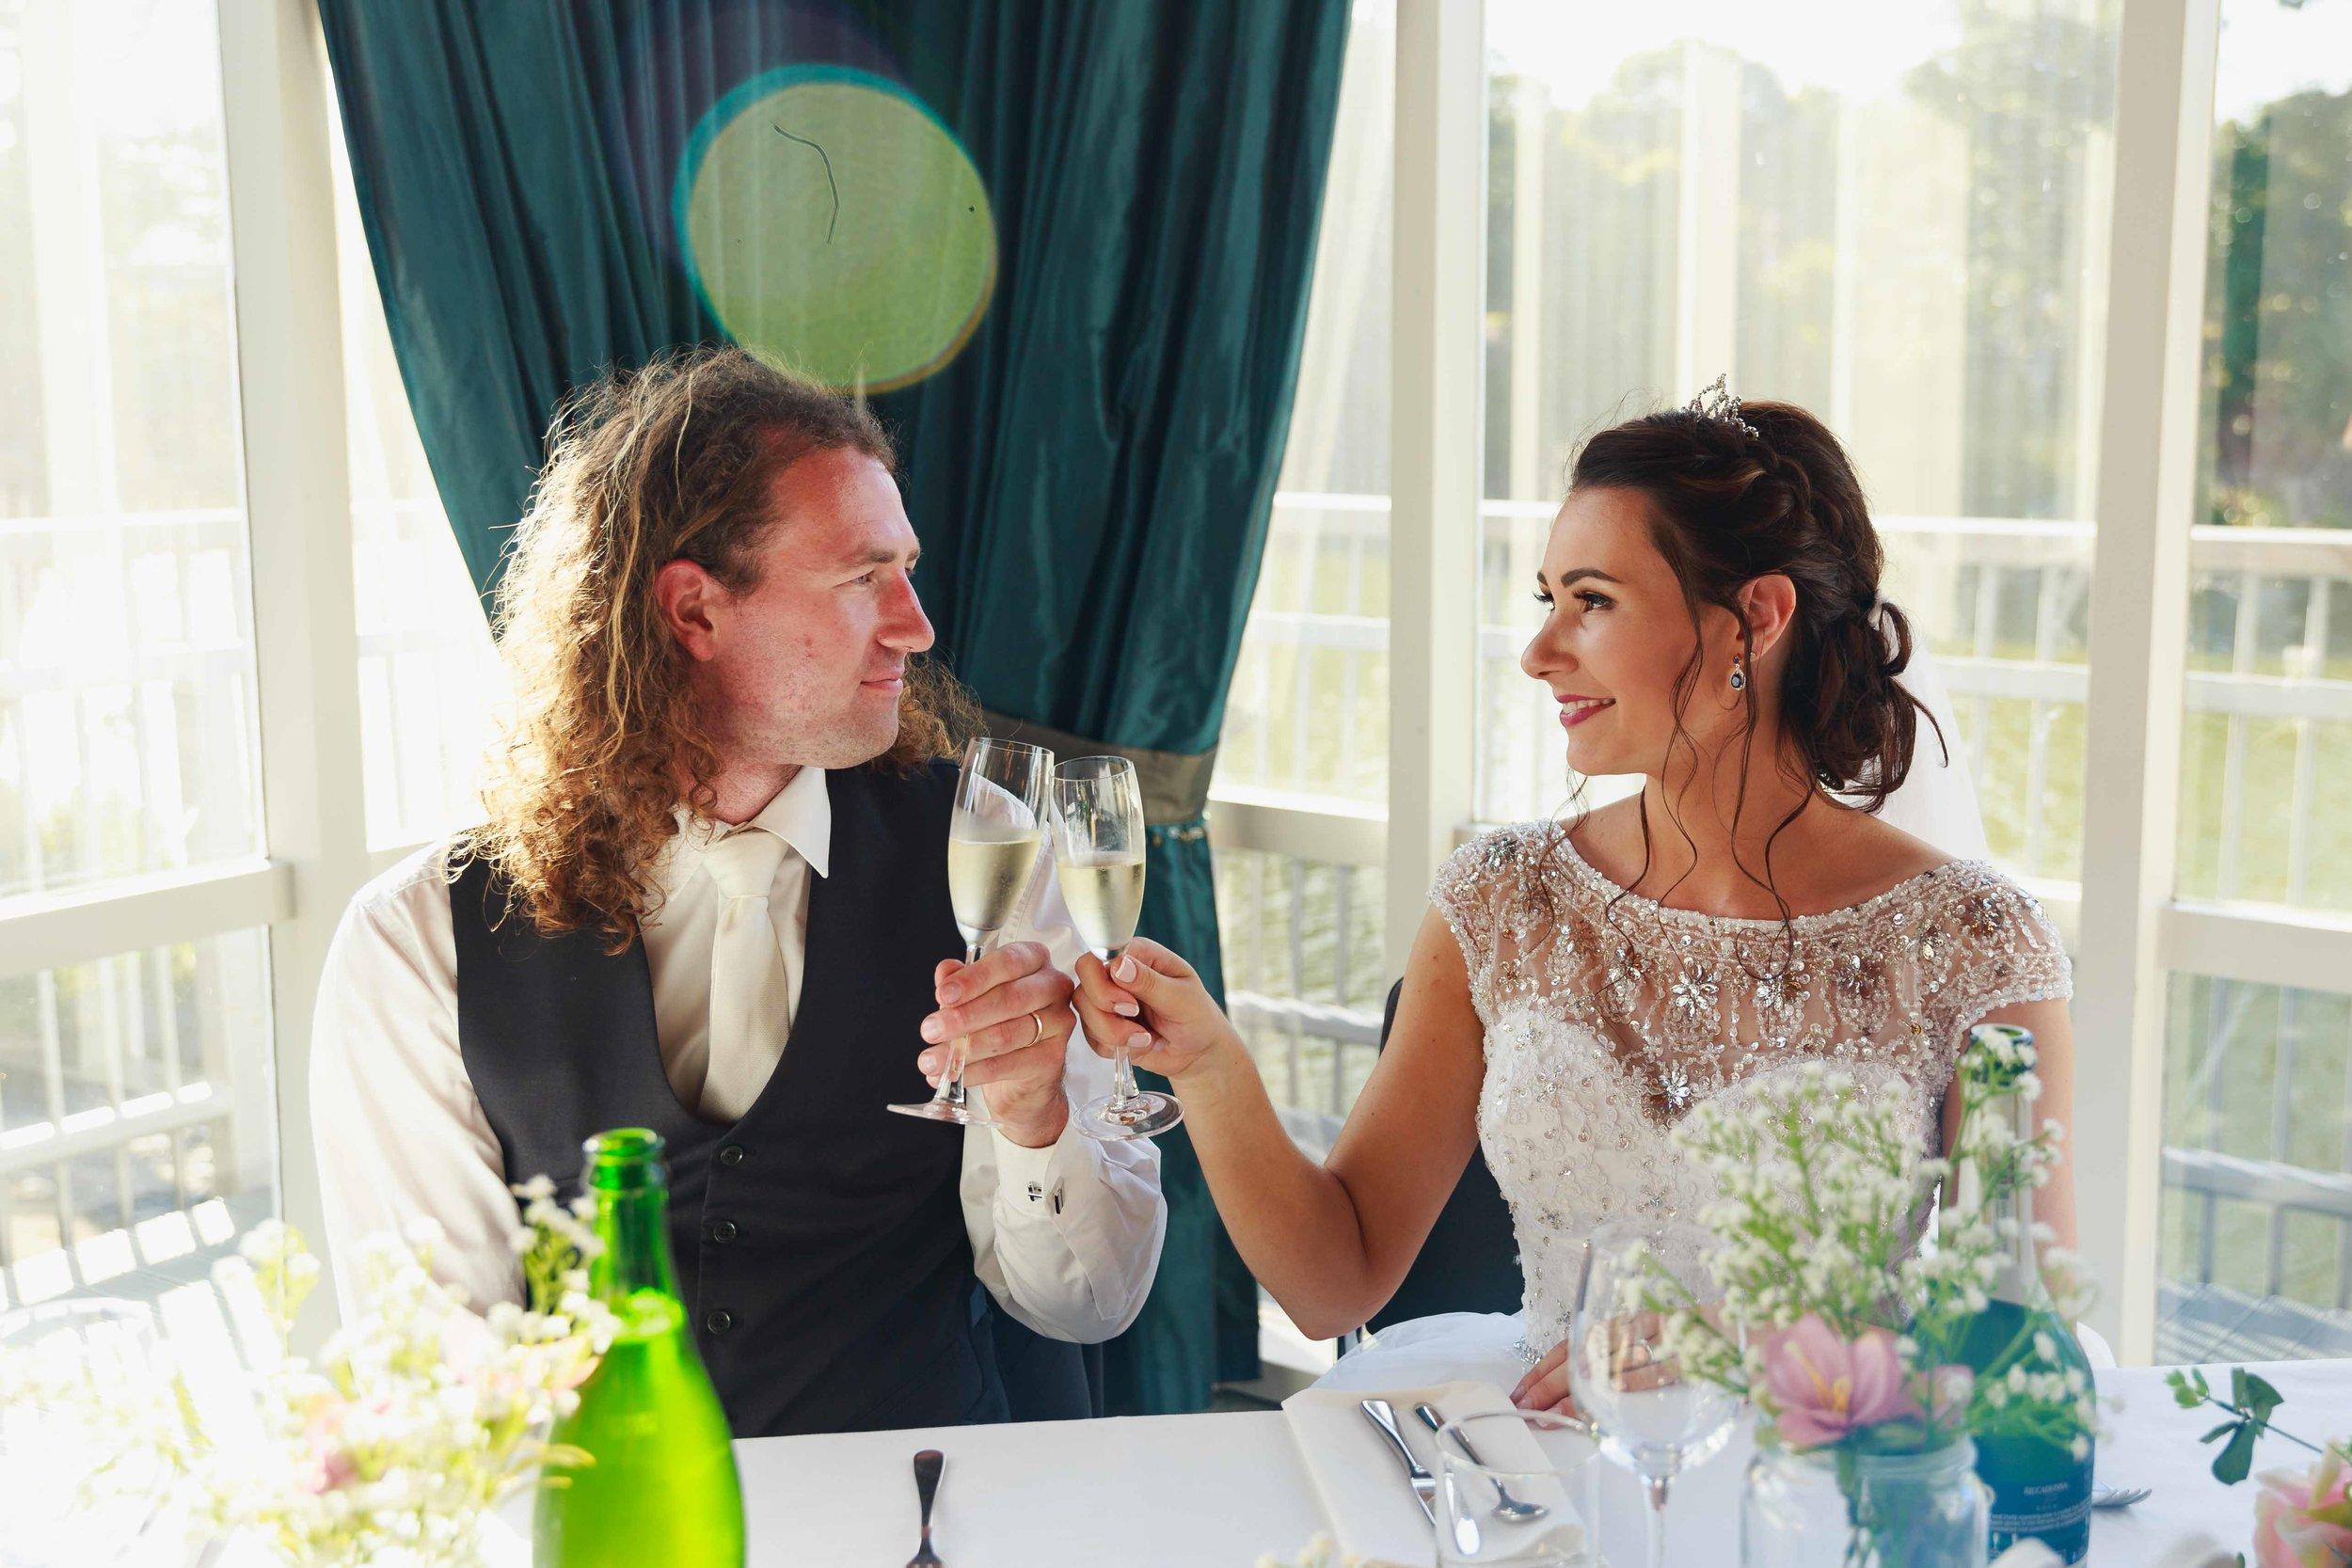 the-chalet-highlight-wedding-photography-palmerston-north-169.jpg